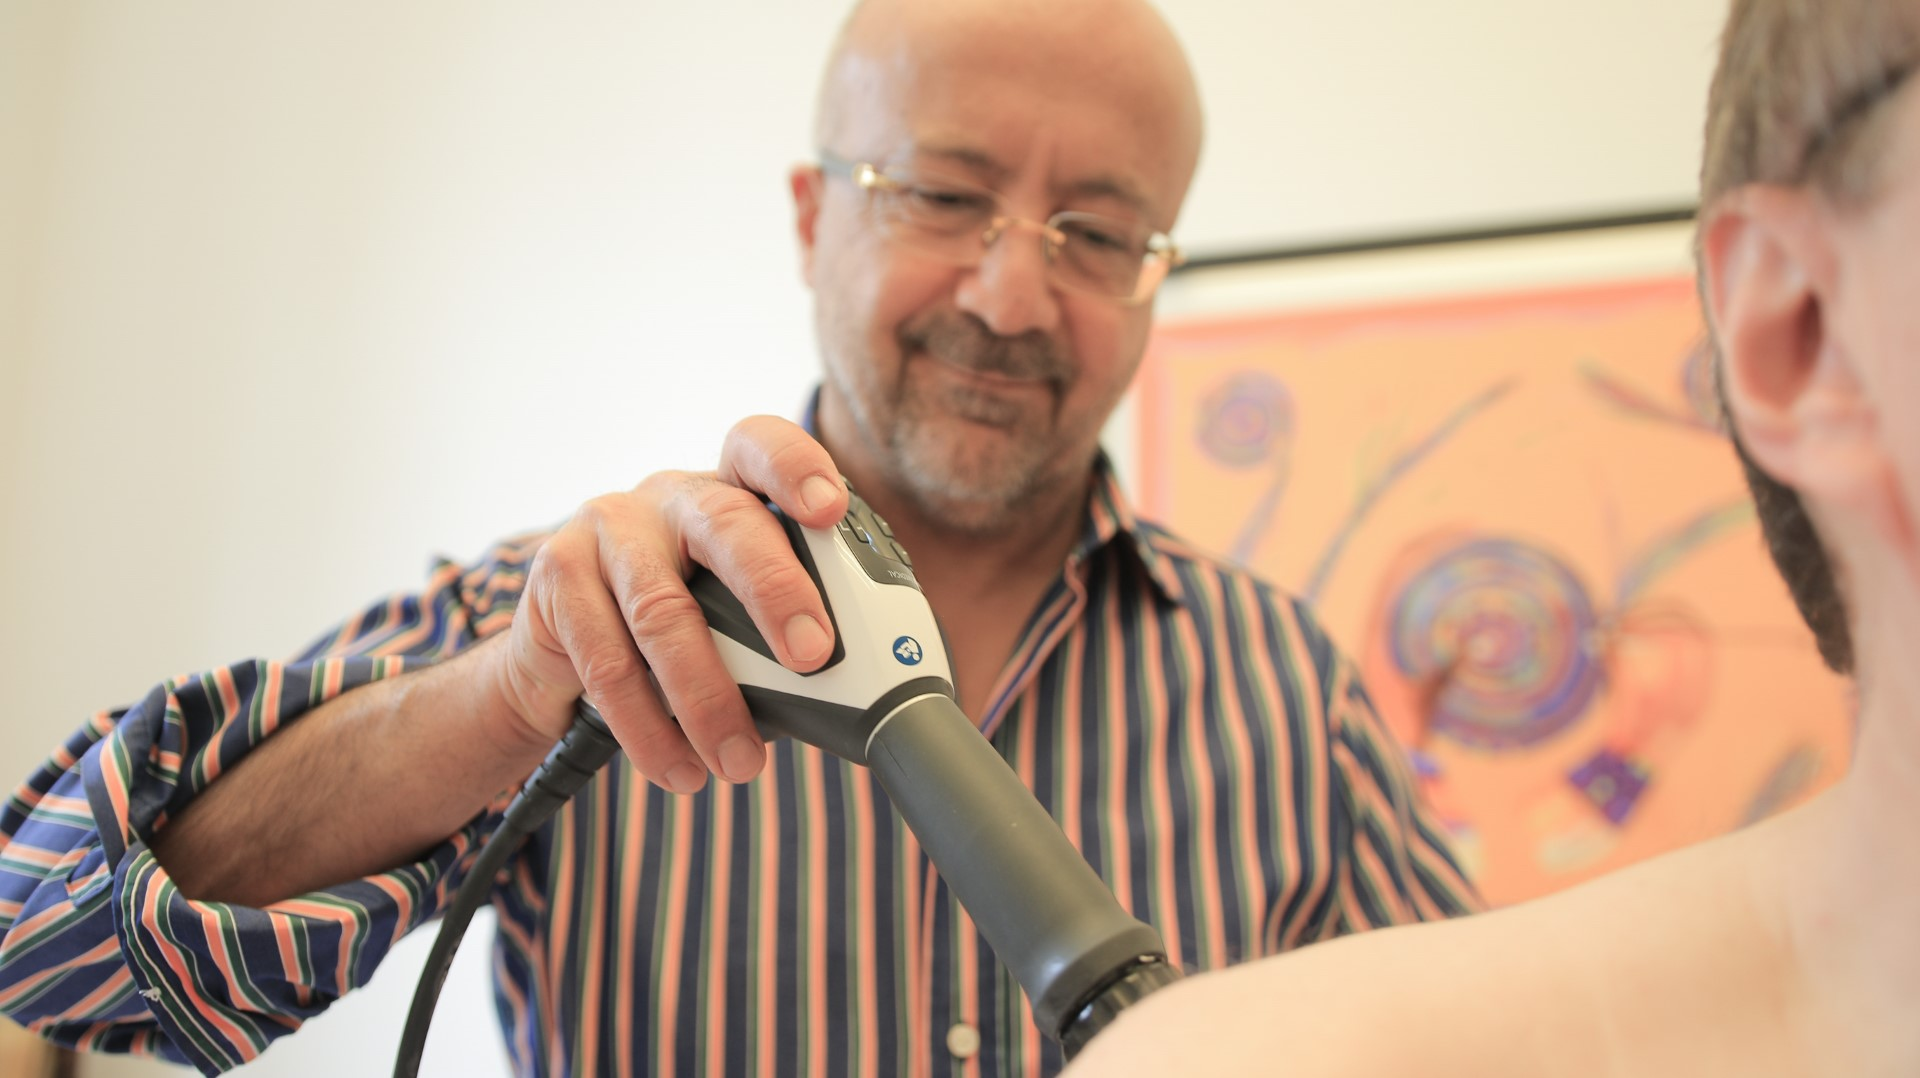 Radiale Stoßwellentherapie Behandlung